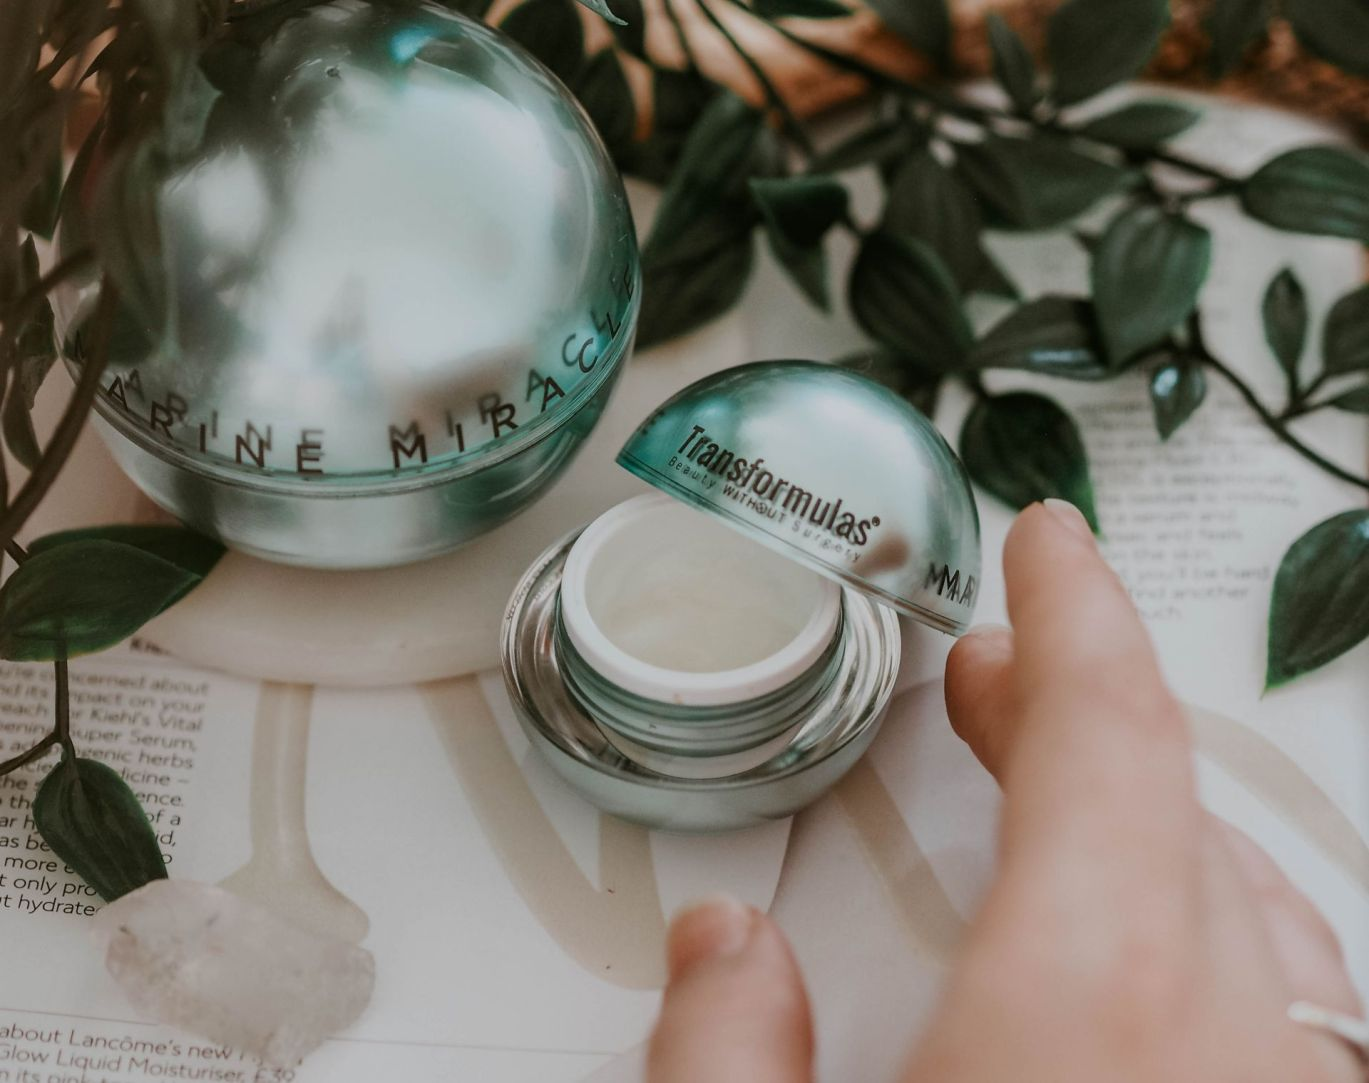 Transformulas Skincare Review Beauty Without Surgery Marine Miricle Creme Eyezone Little Miss Kate Winney